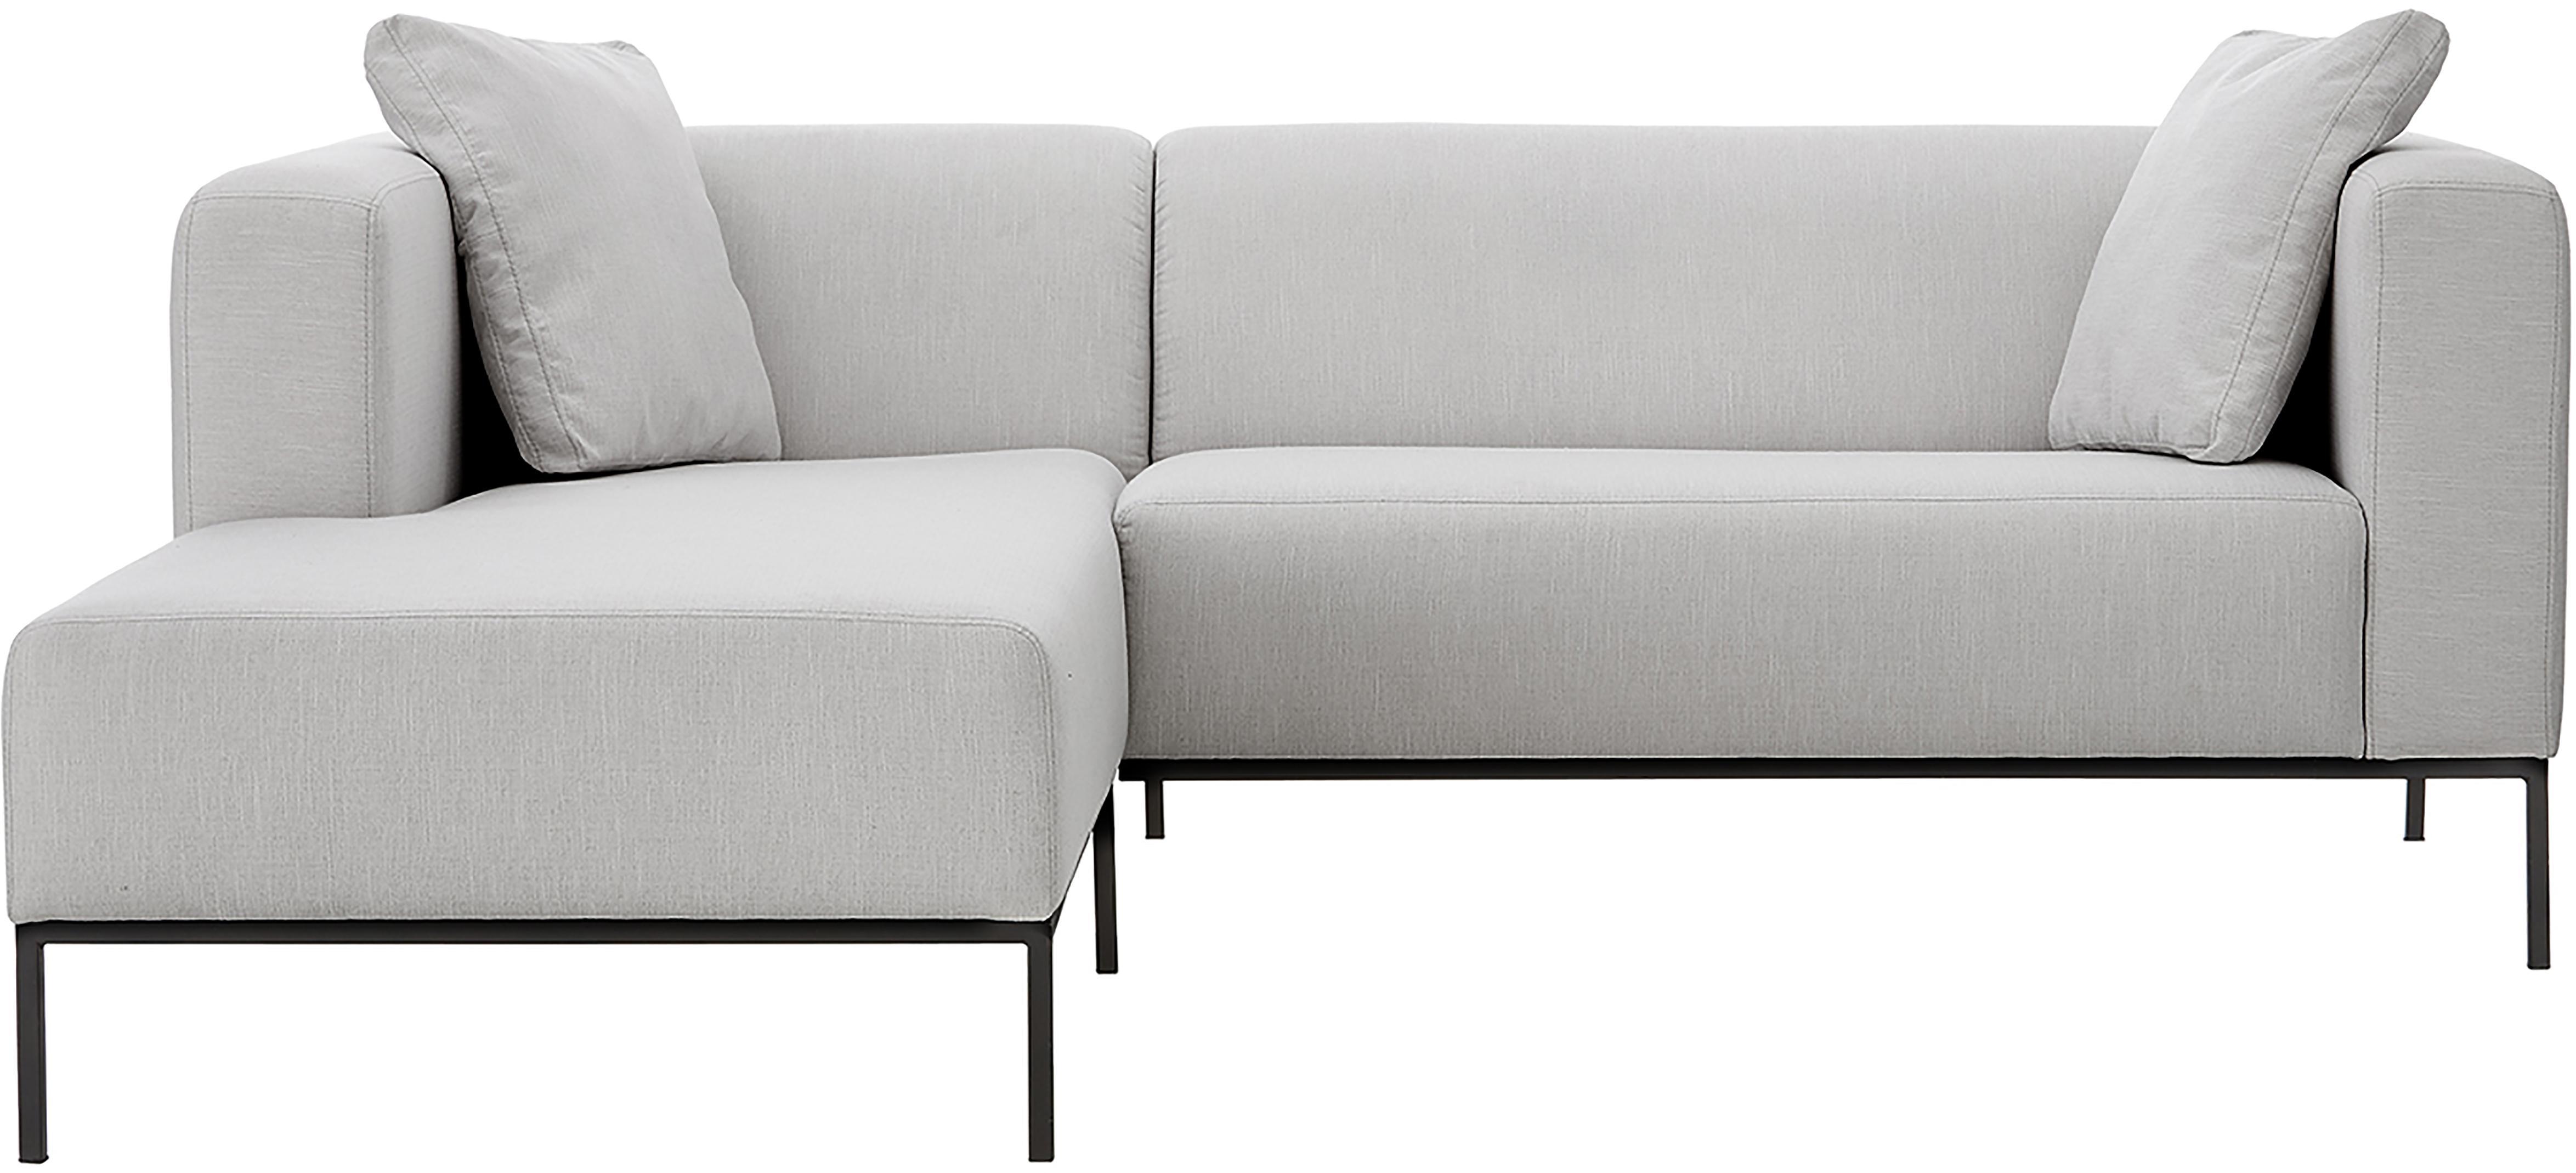 Hoekbank Carrie, Bekleding: polyester, Frame: spaanplaat, hardboard, mu, Poten: gelakt metaal, Geweven stof grijs, B 241 x D 200 cm